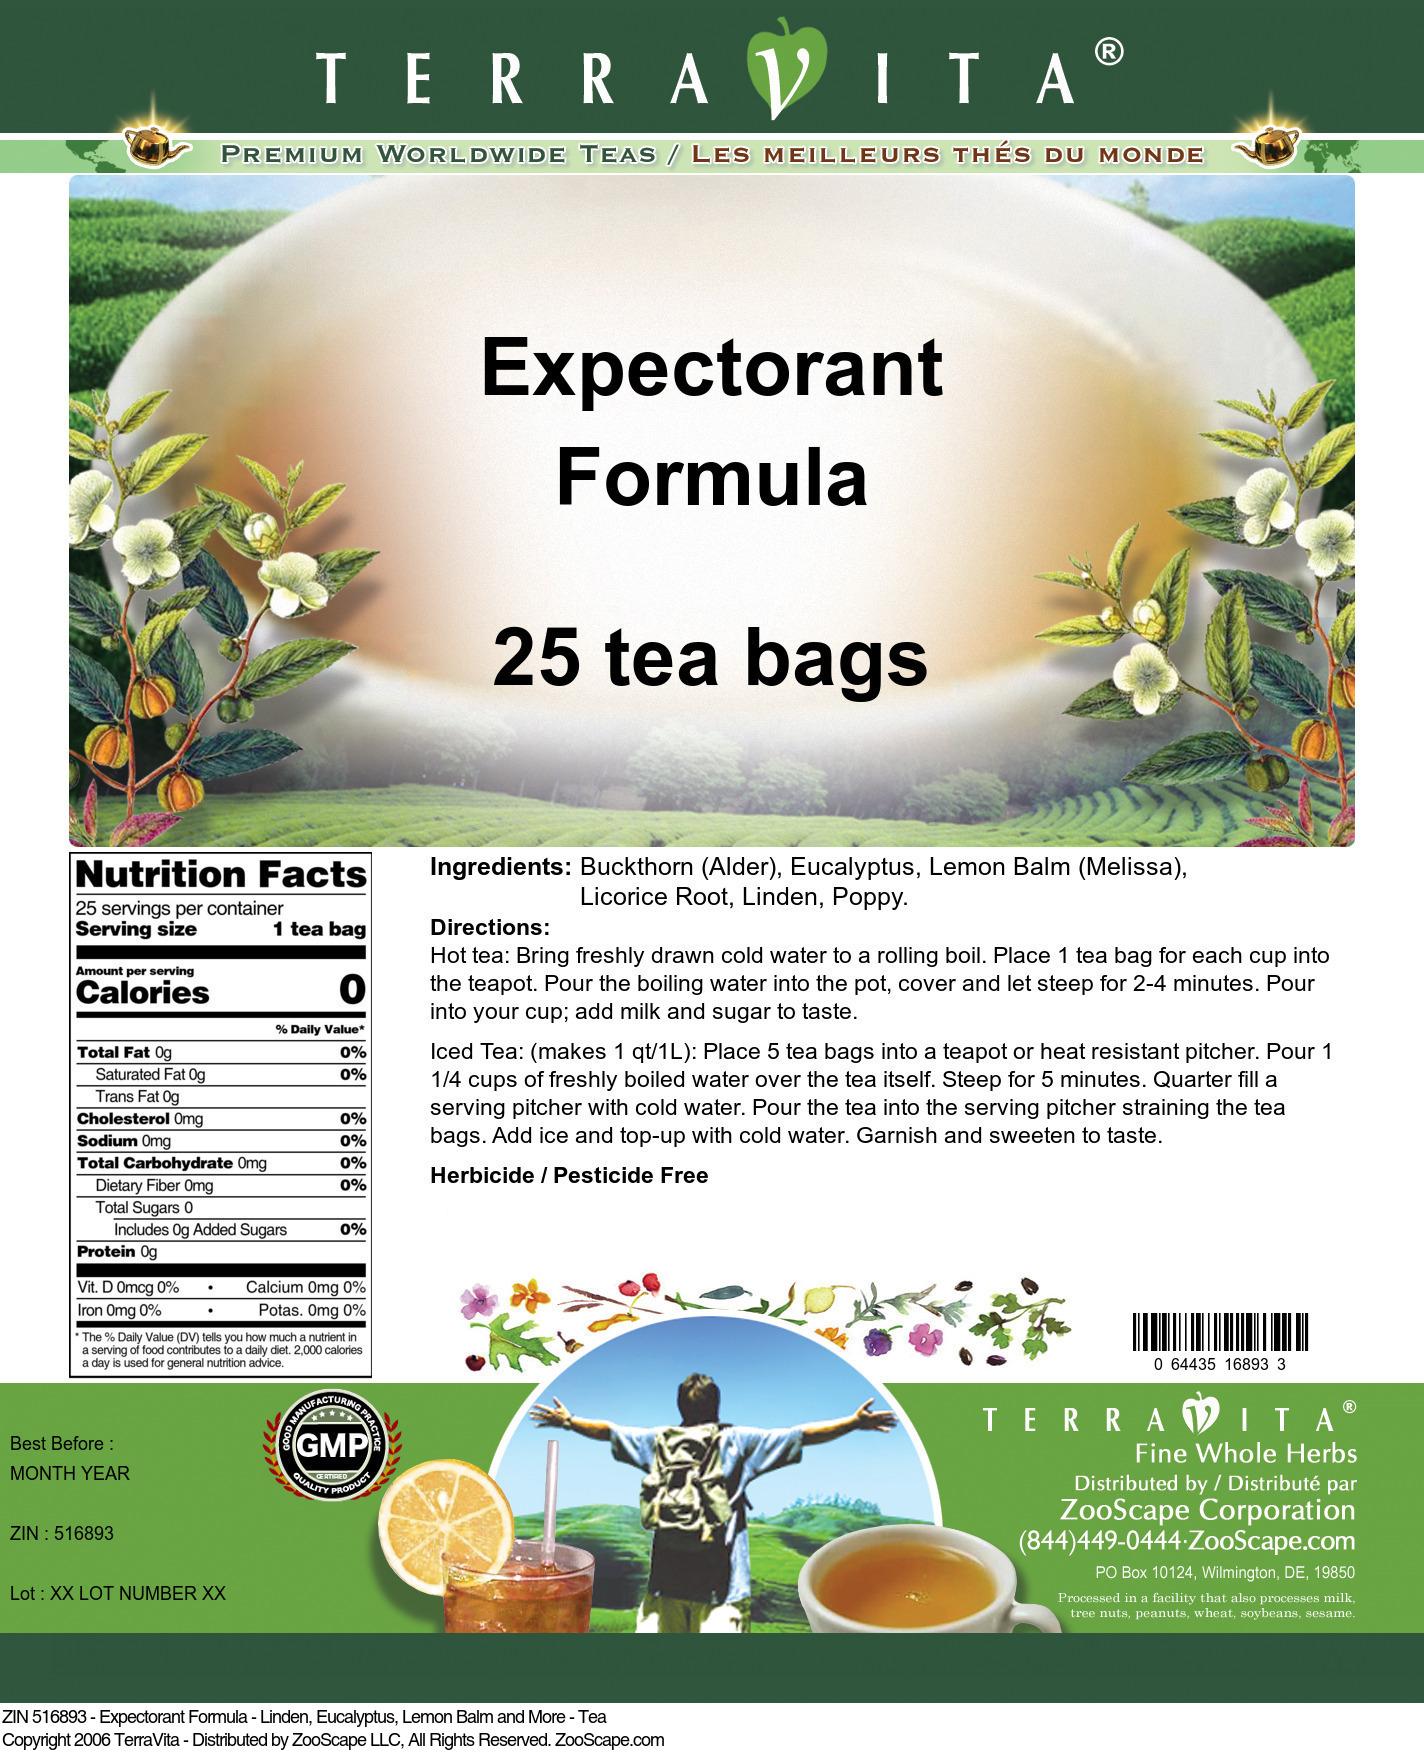 Expectorant Formula - Linden, Eucalyptus, Lemon Balm and More - Tea